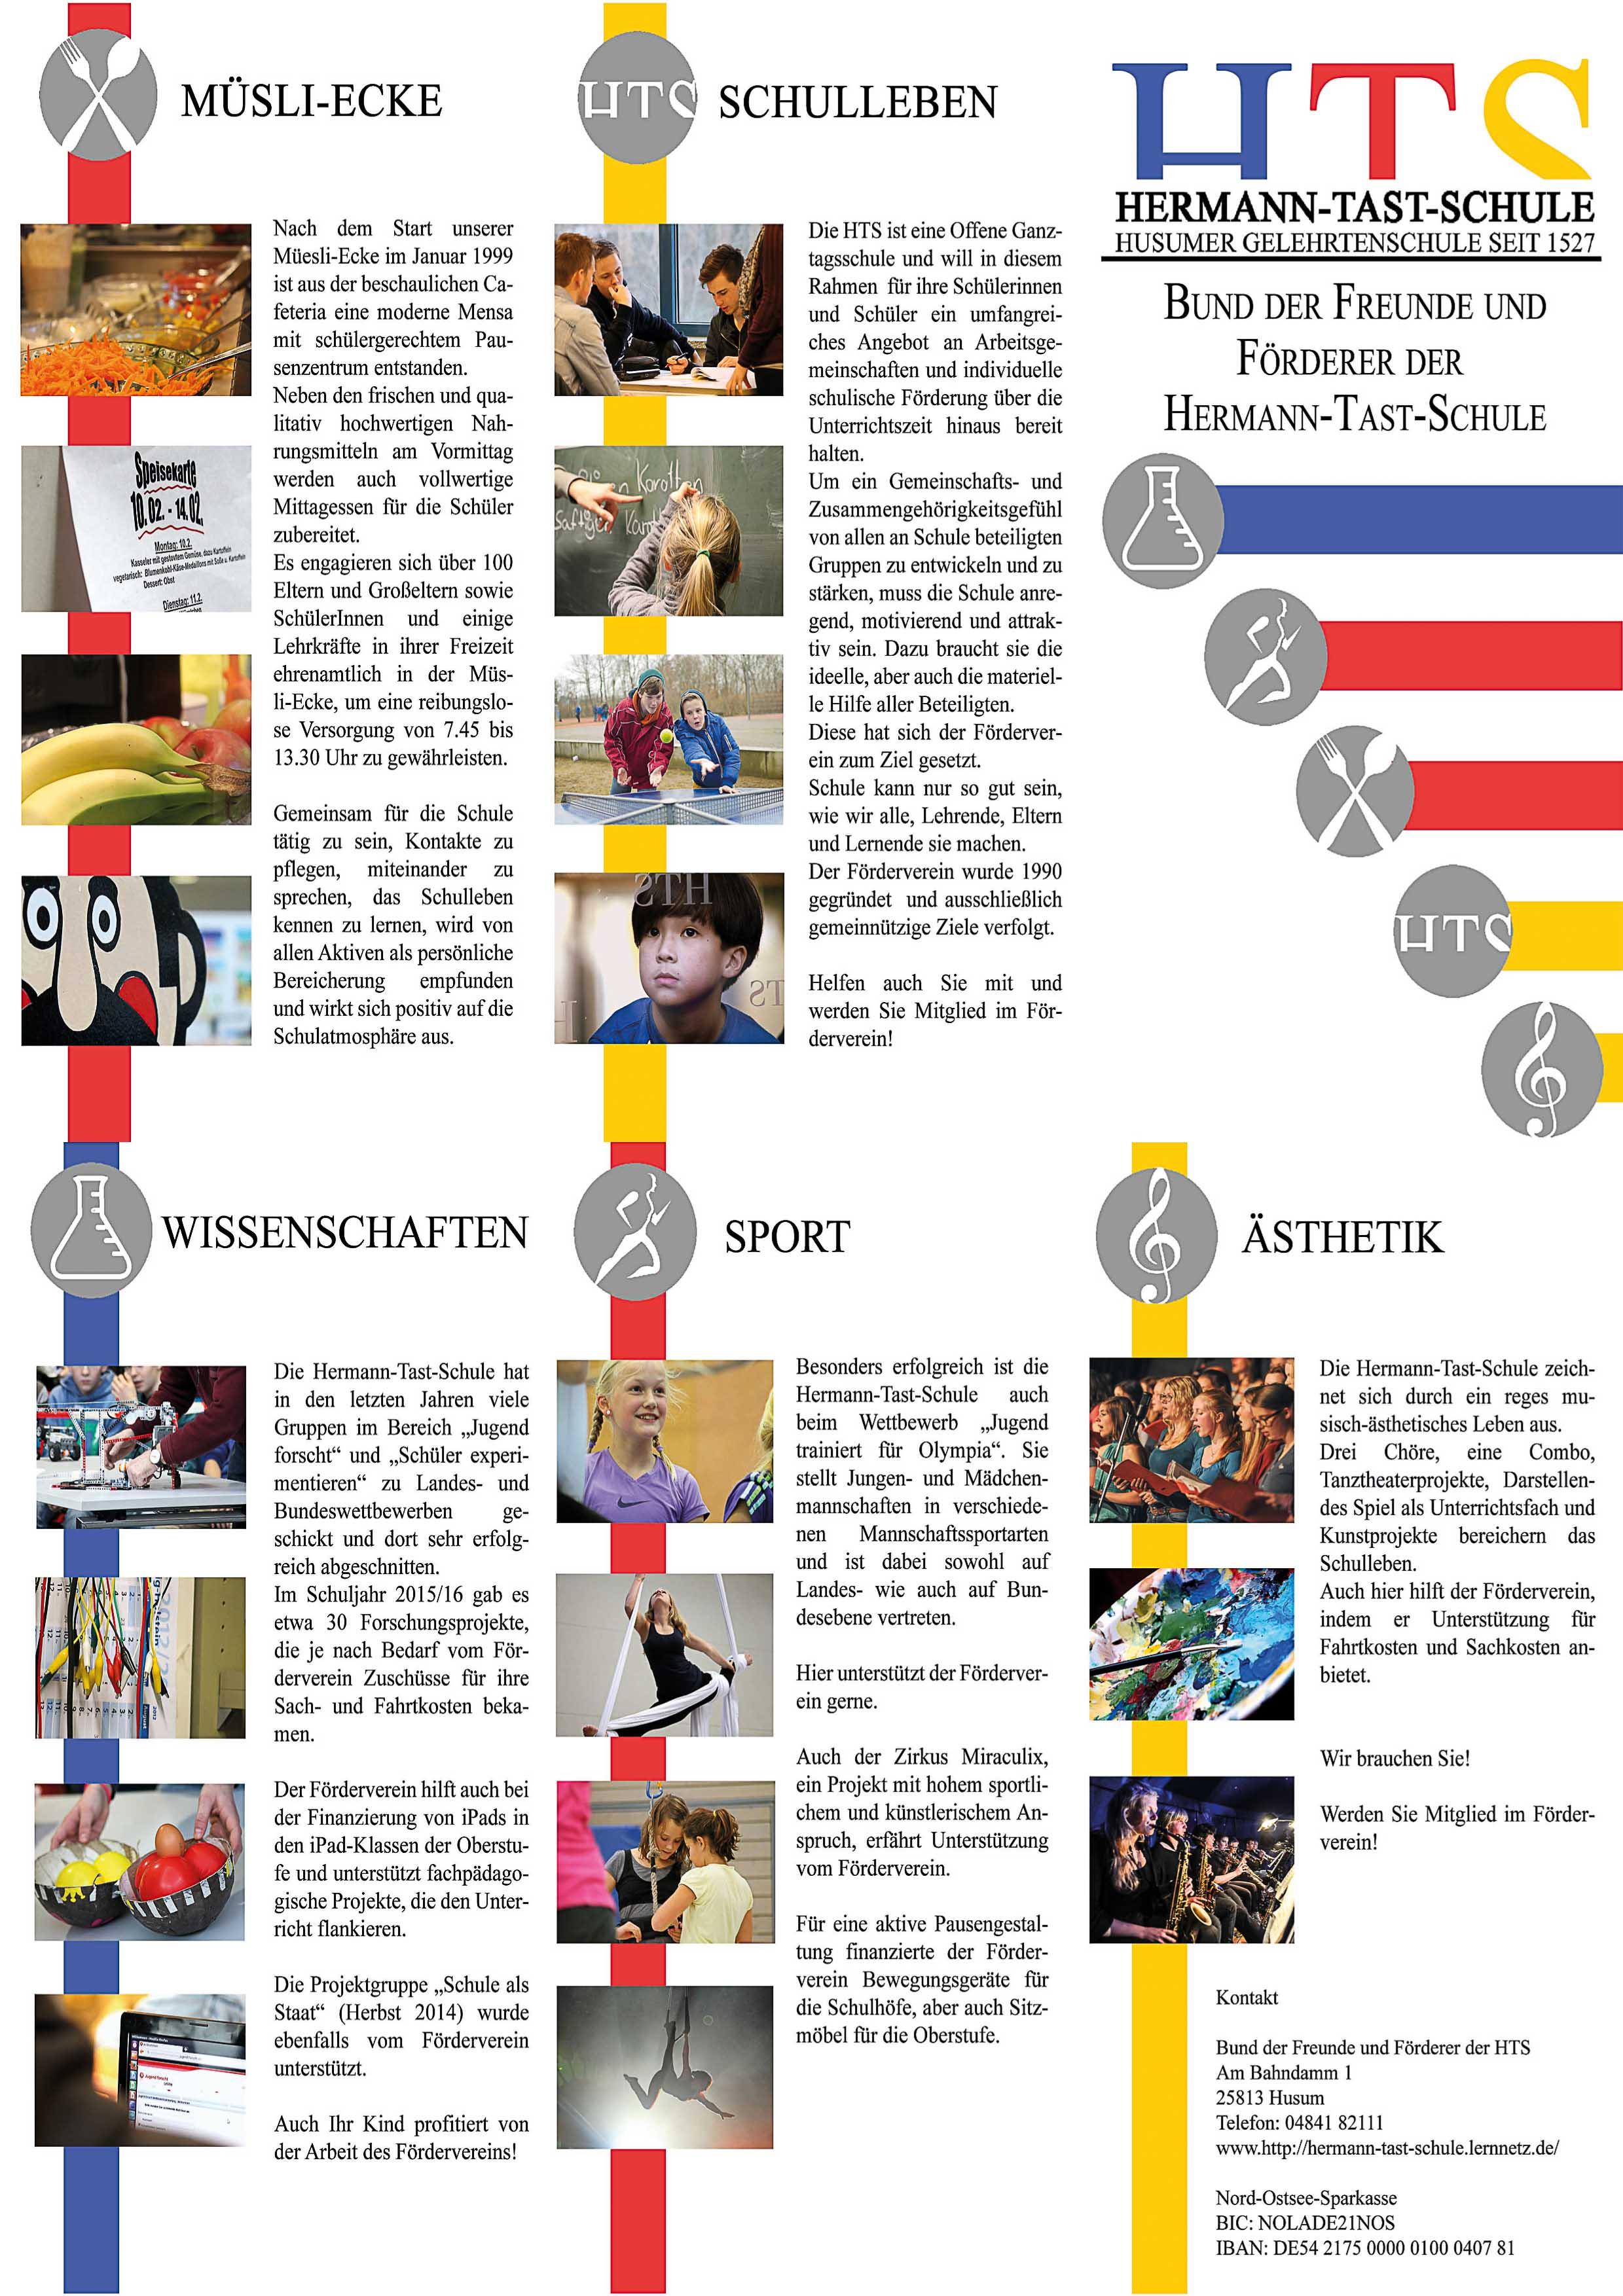 Förderverein - Hermann-Tast-Schule